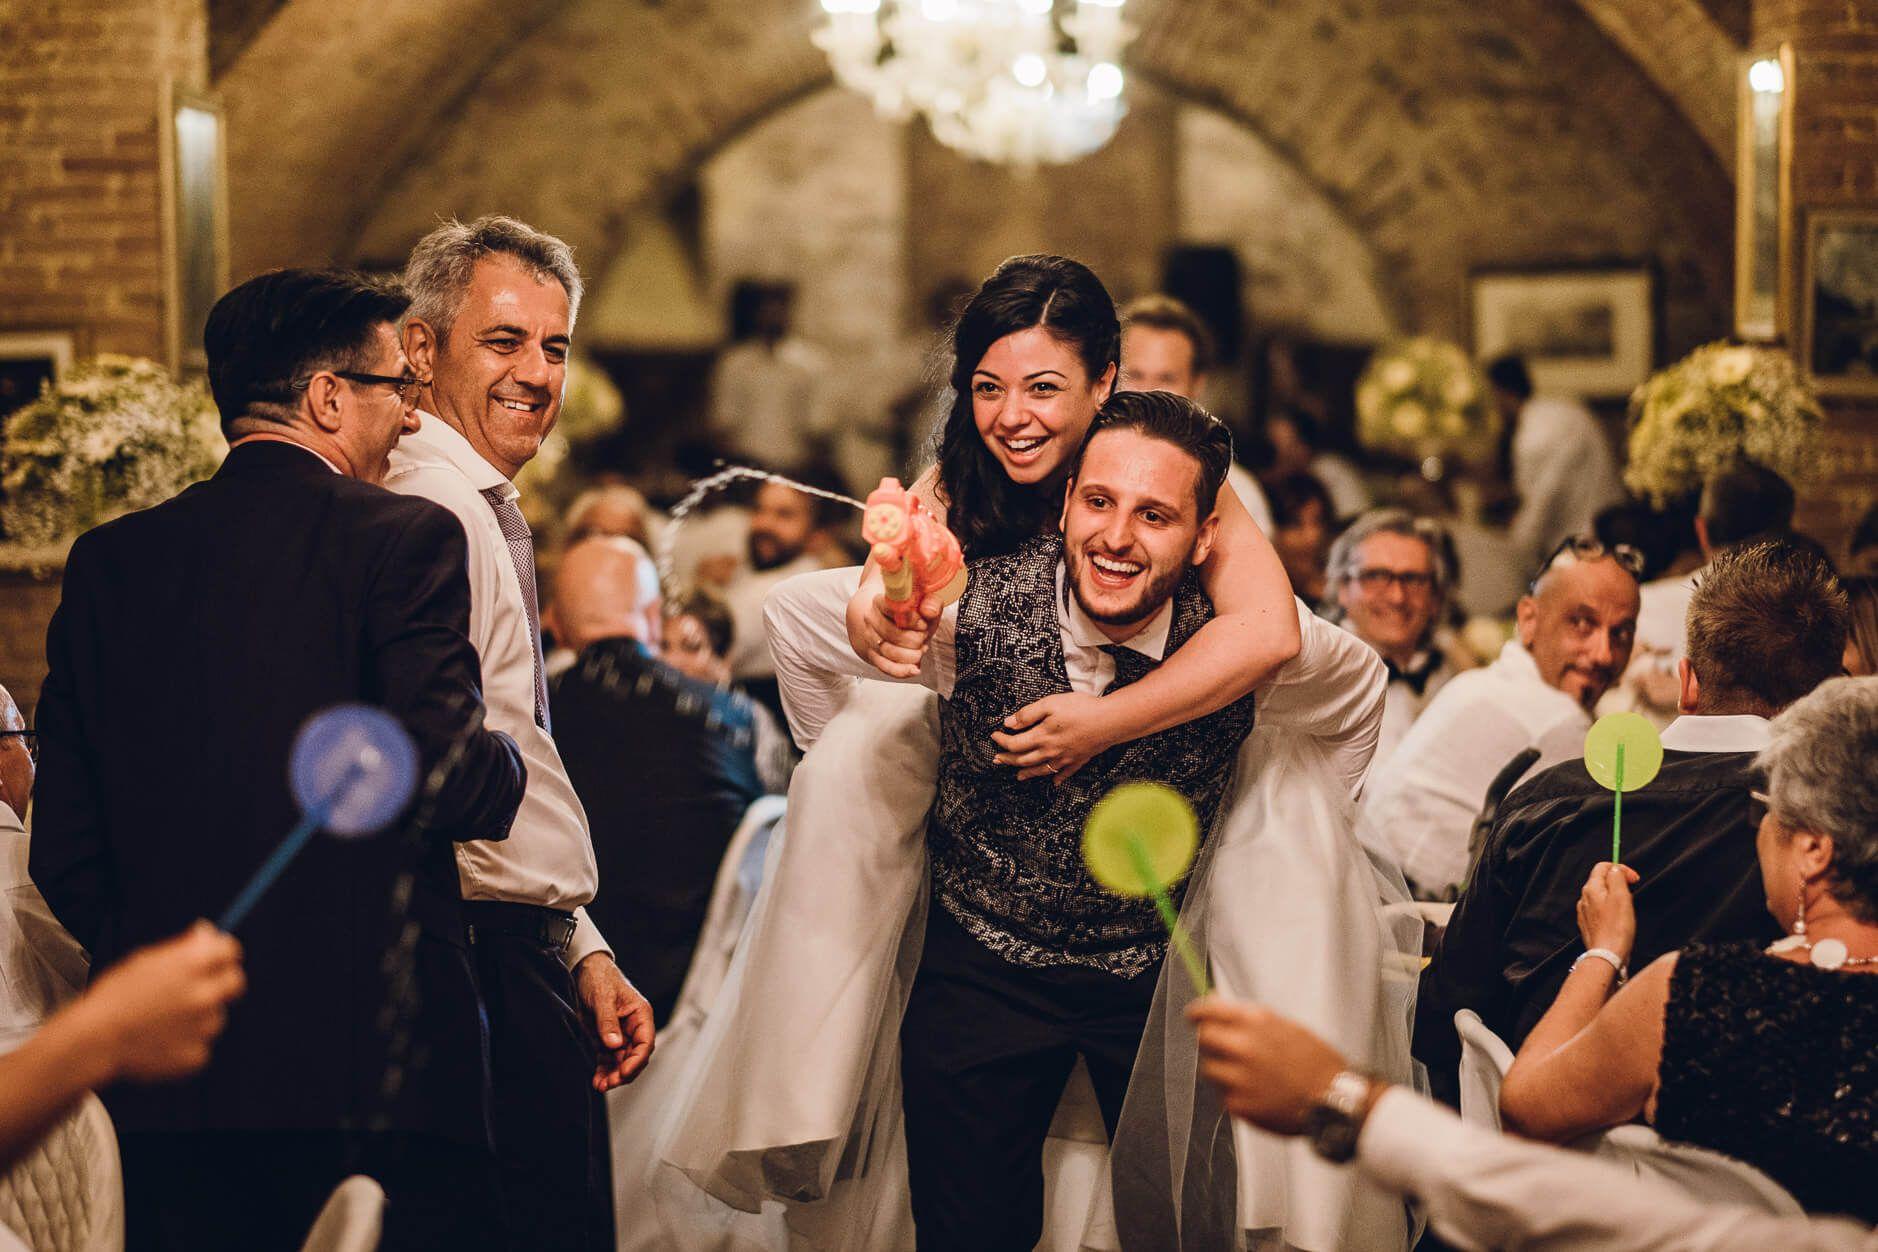 15 Idee Di Scherzi Per Matrimonio Divertenti E Originali Joyphotographers Magazine Nel 2020 Matrimonio Divertente Matrimonio Idee Per Matrimoni